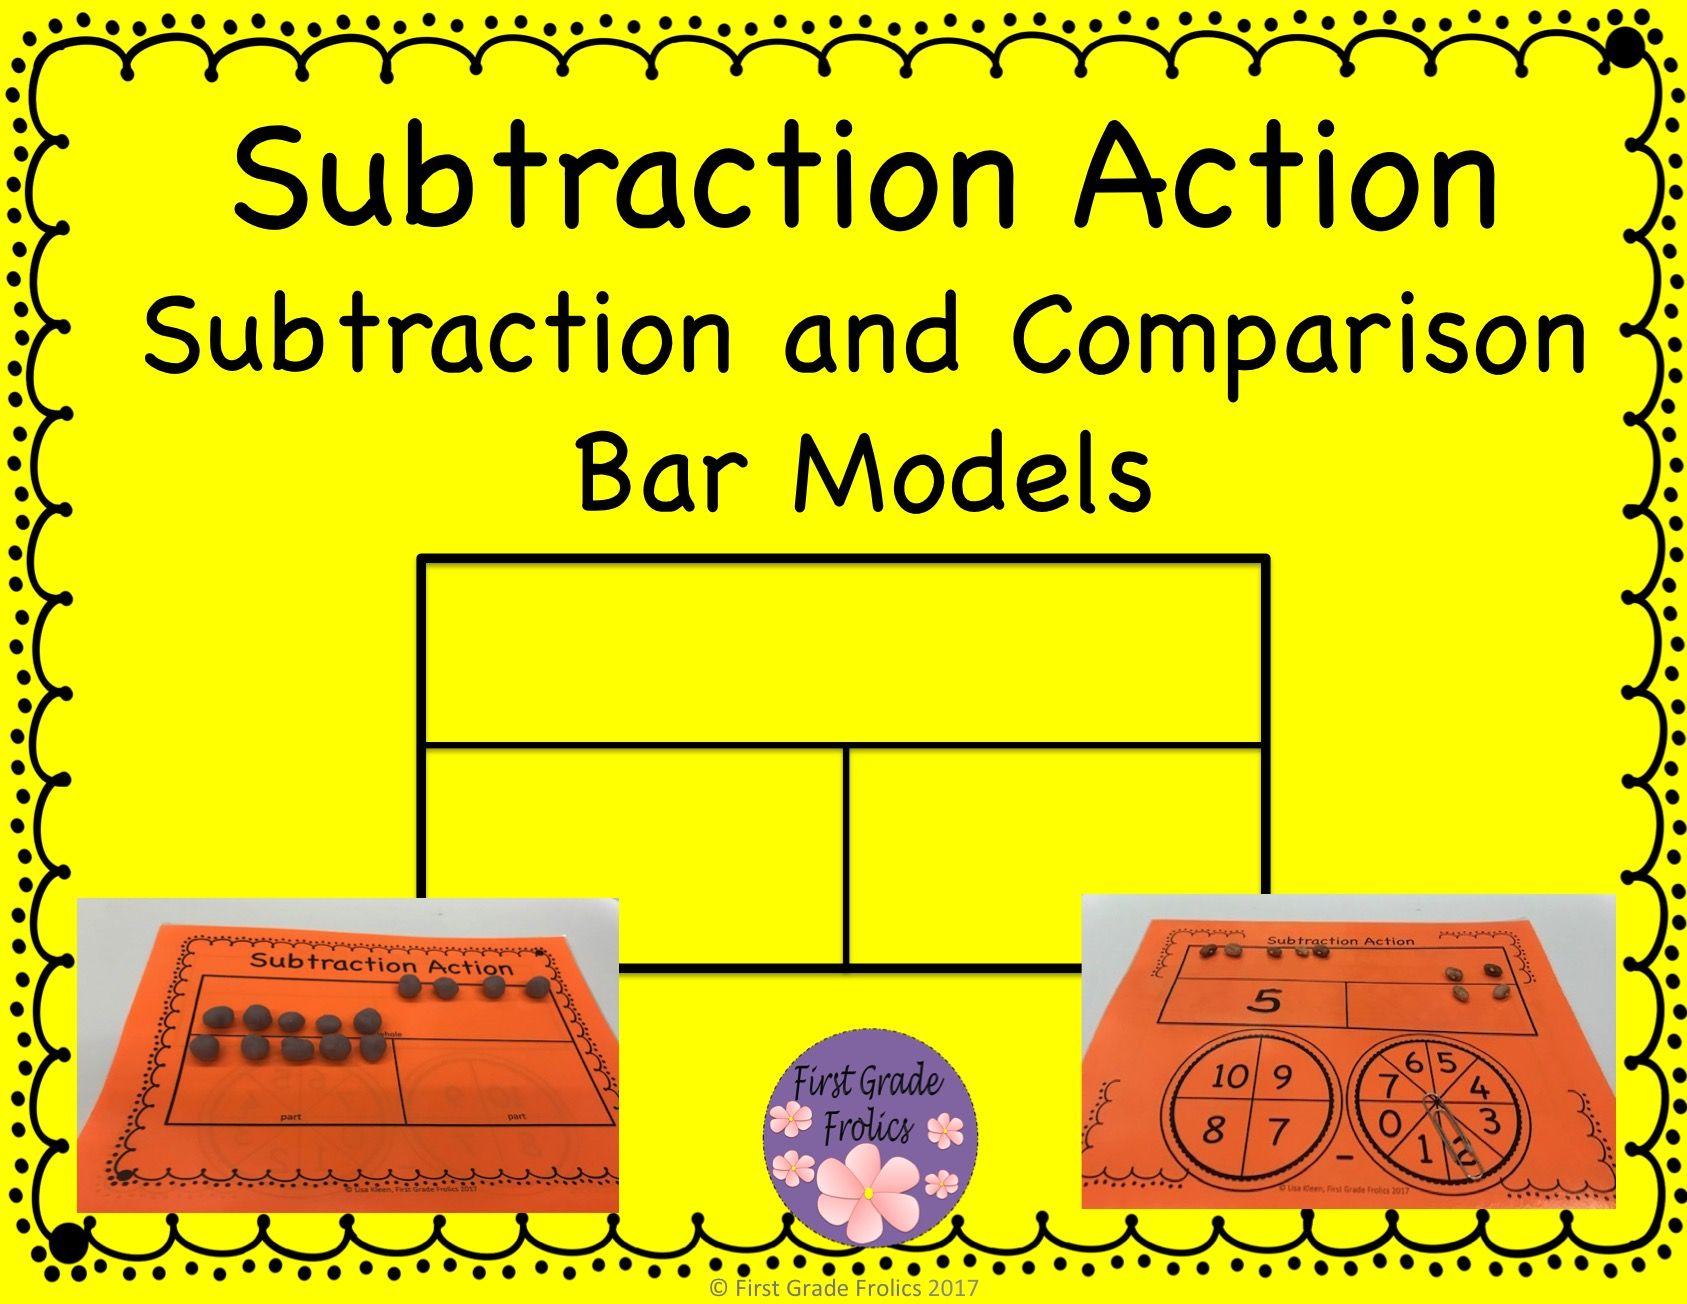 medium resolution of Subtraction Action Bar Models from First Grade Frolics   Subtraction